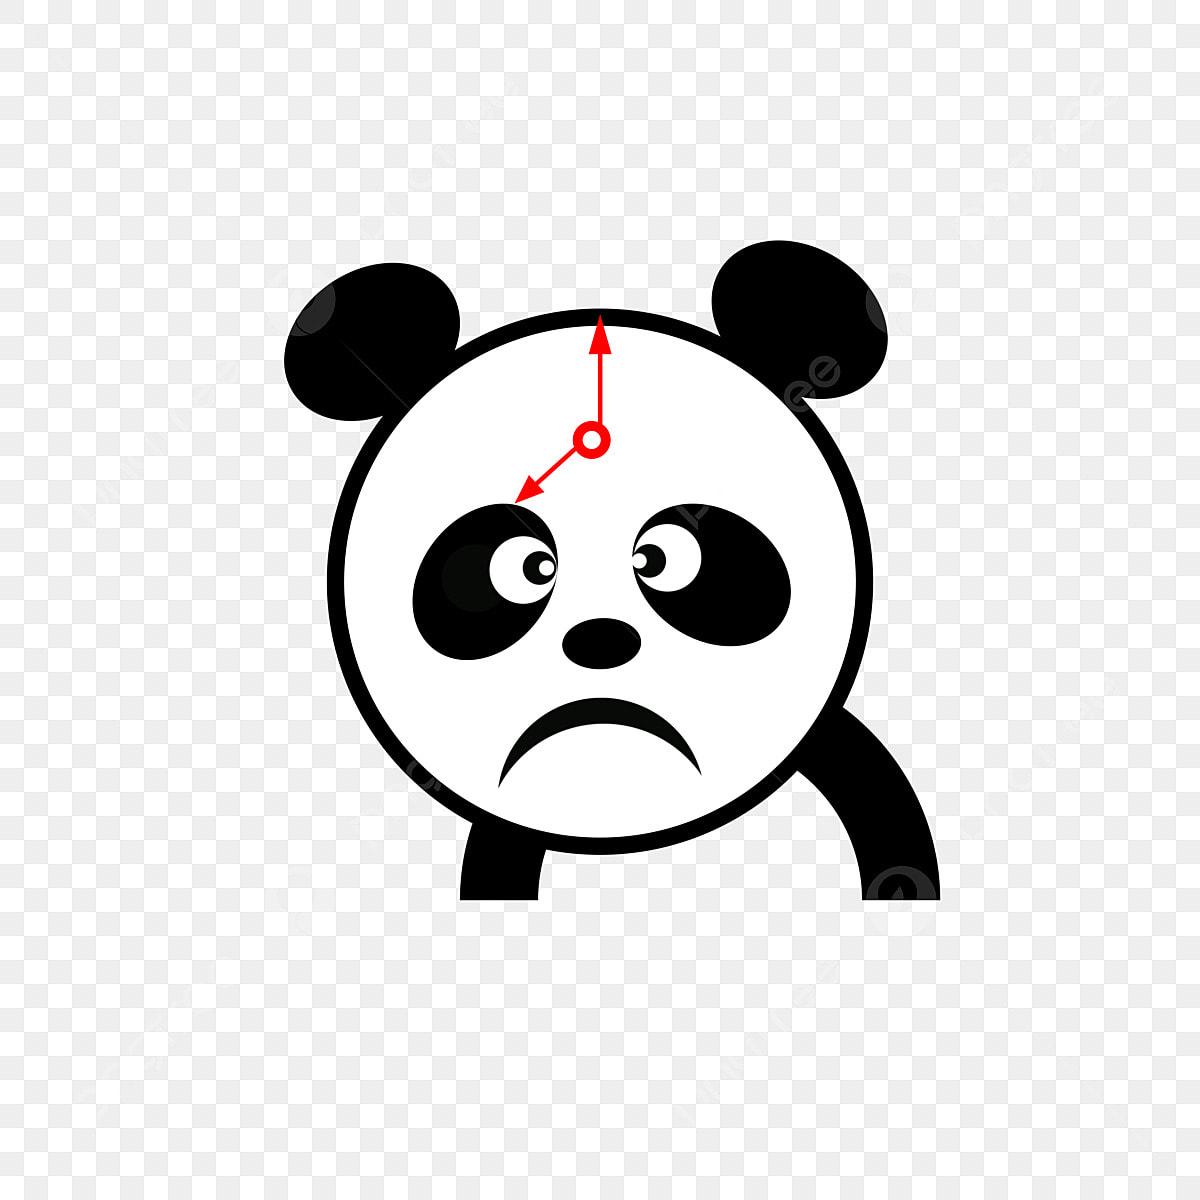 Panda Jam Muat Turun Jam Lucu Panda Jam Omong Kosong Jam